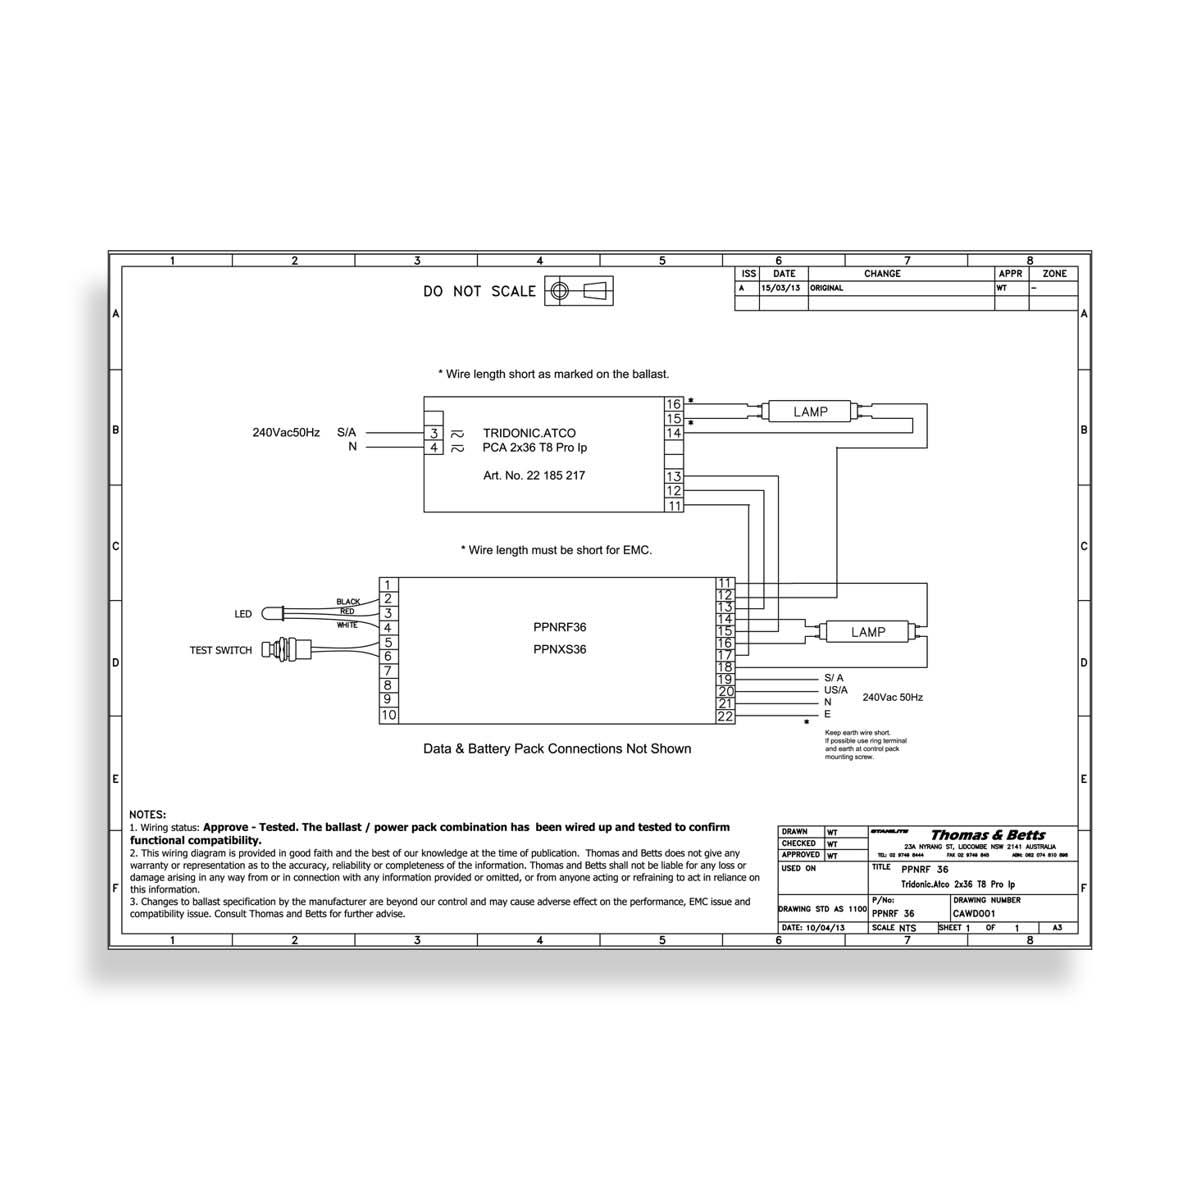 resourceswiringdiagram_el4ph?wid=618&hei=300 thomas & betts australasia resources end user tools wiring vossloh schwabe ballast wiring diagram at metegol.co